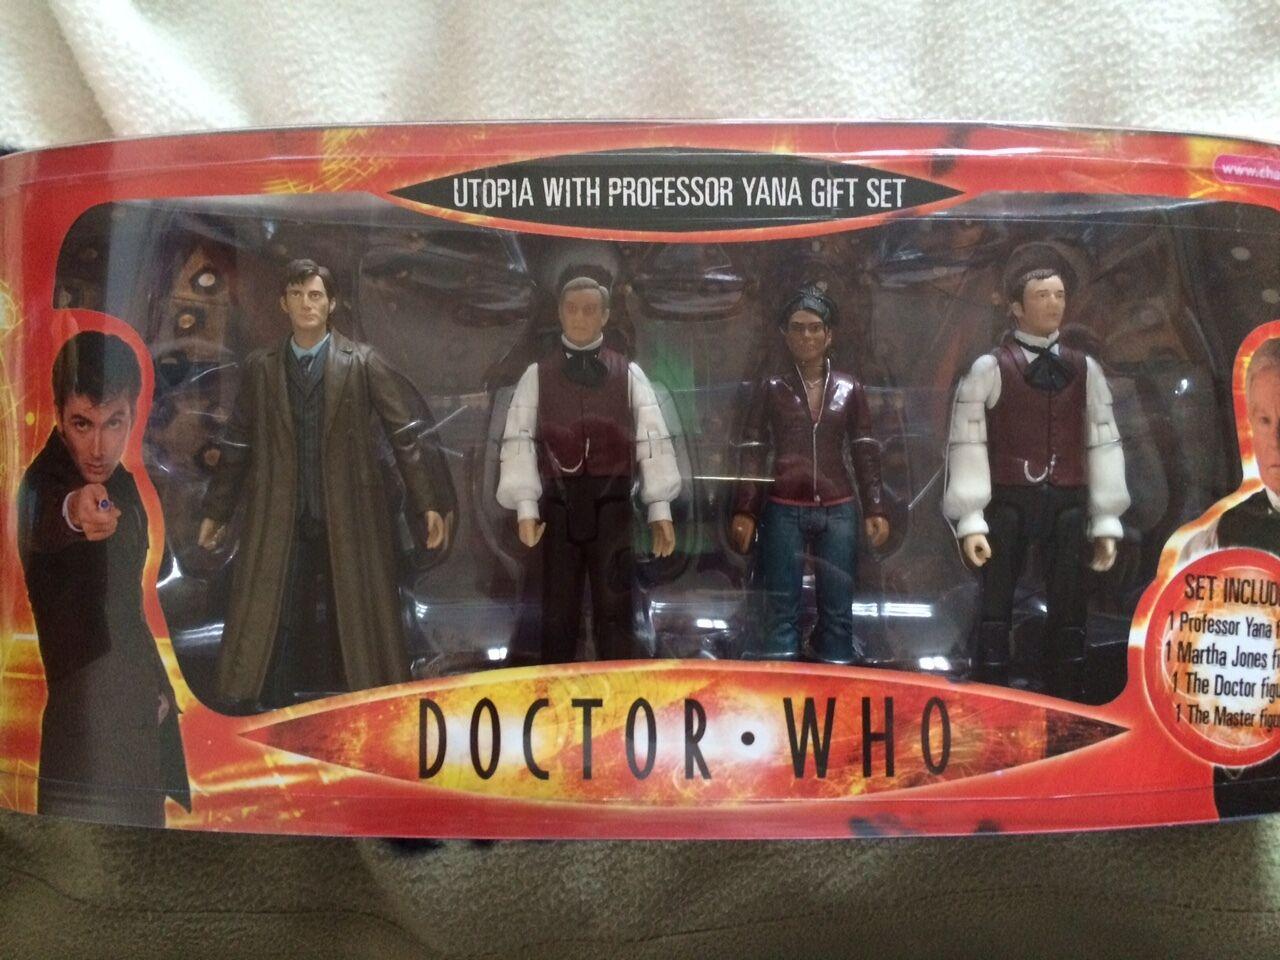 Doktor, die utopie mit professor yana, martha, 10. doktor, meister festgelegten zahl